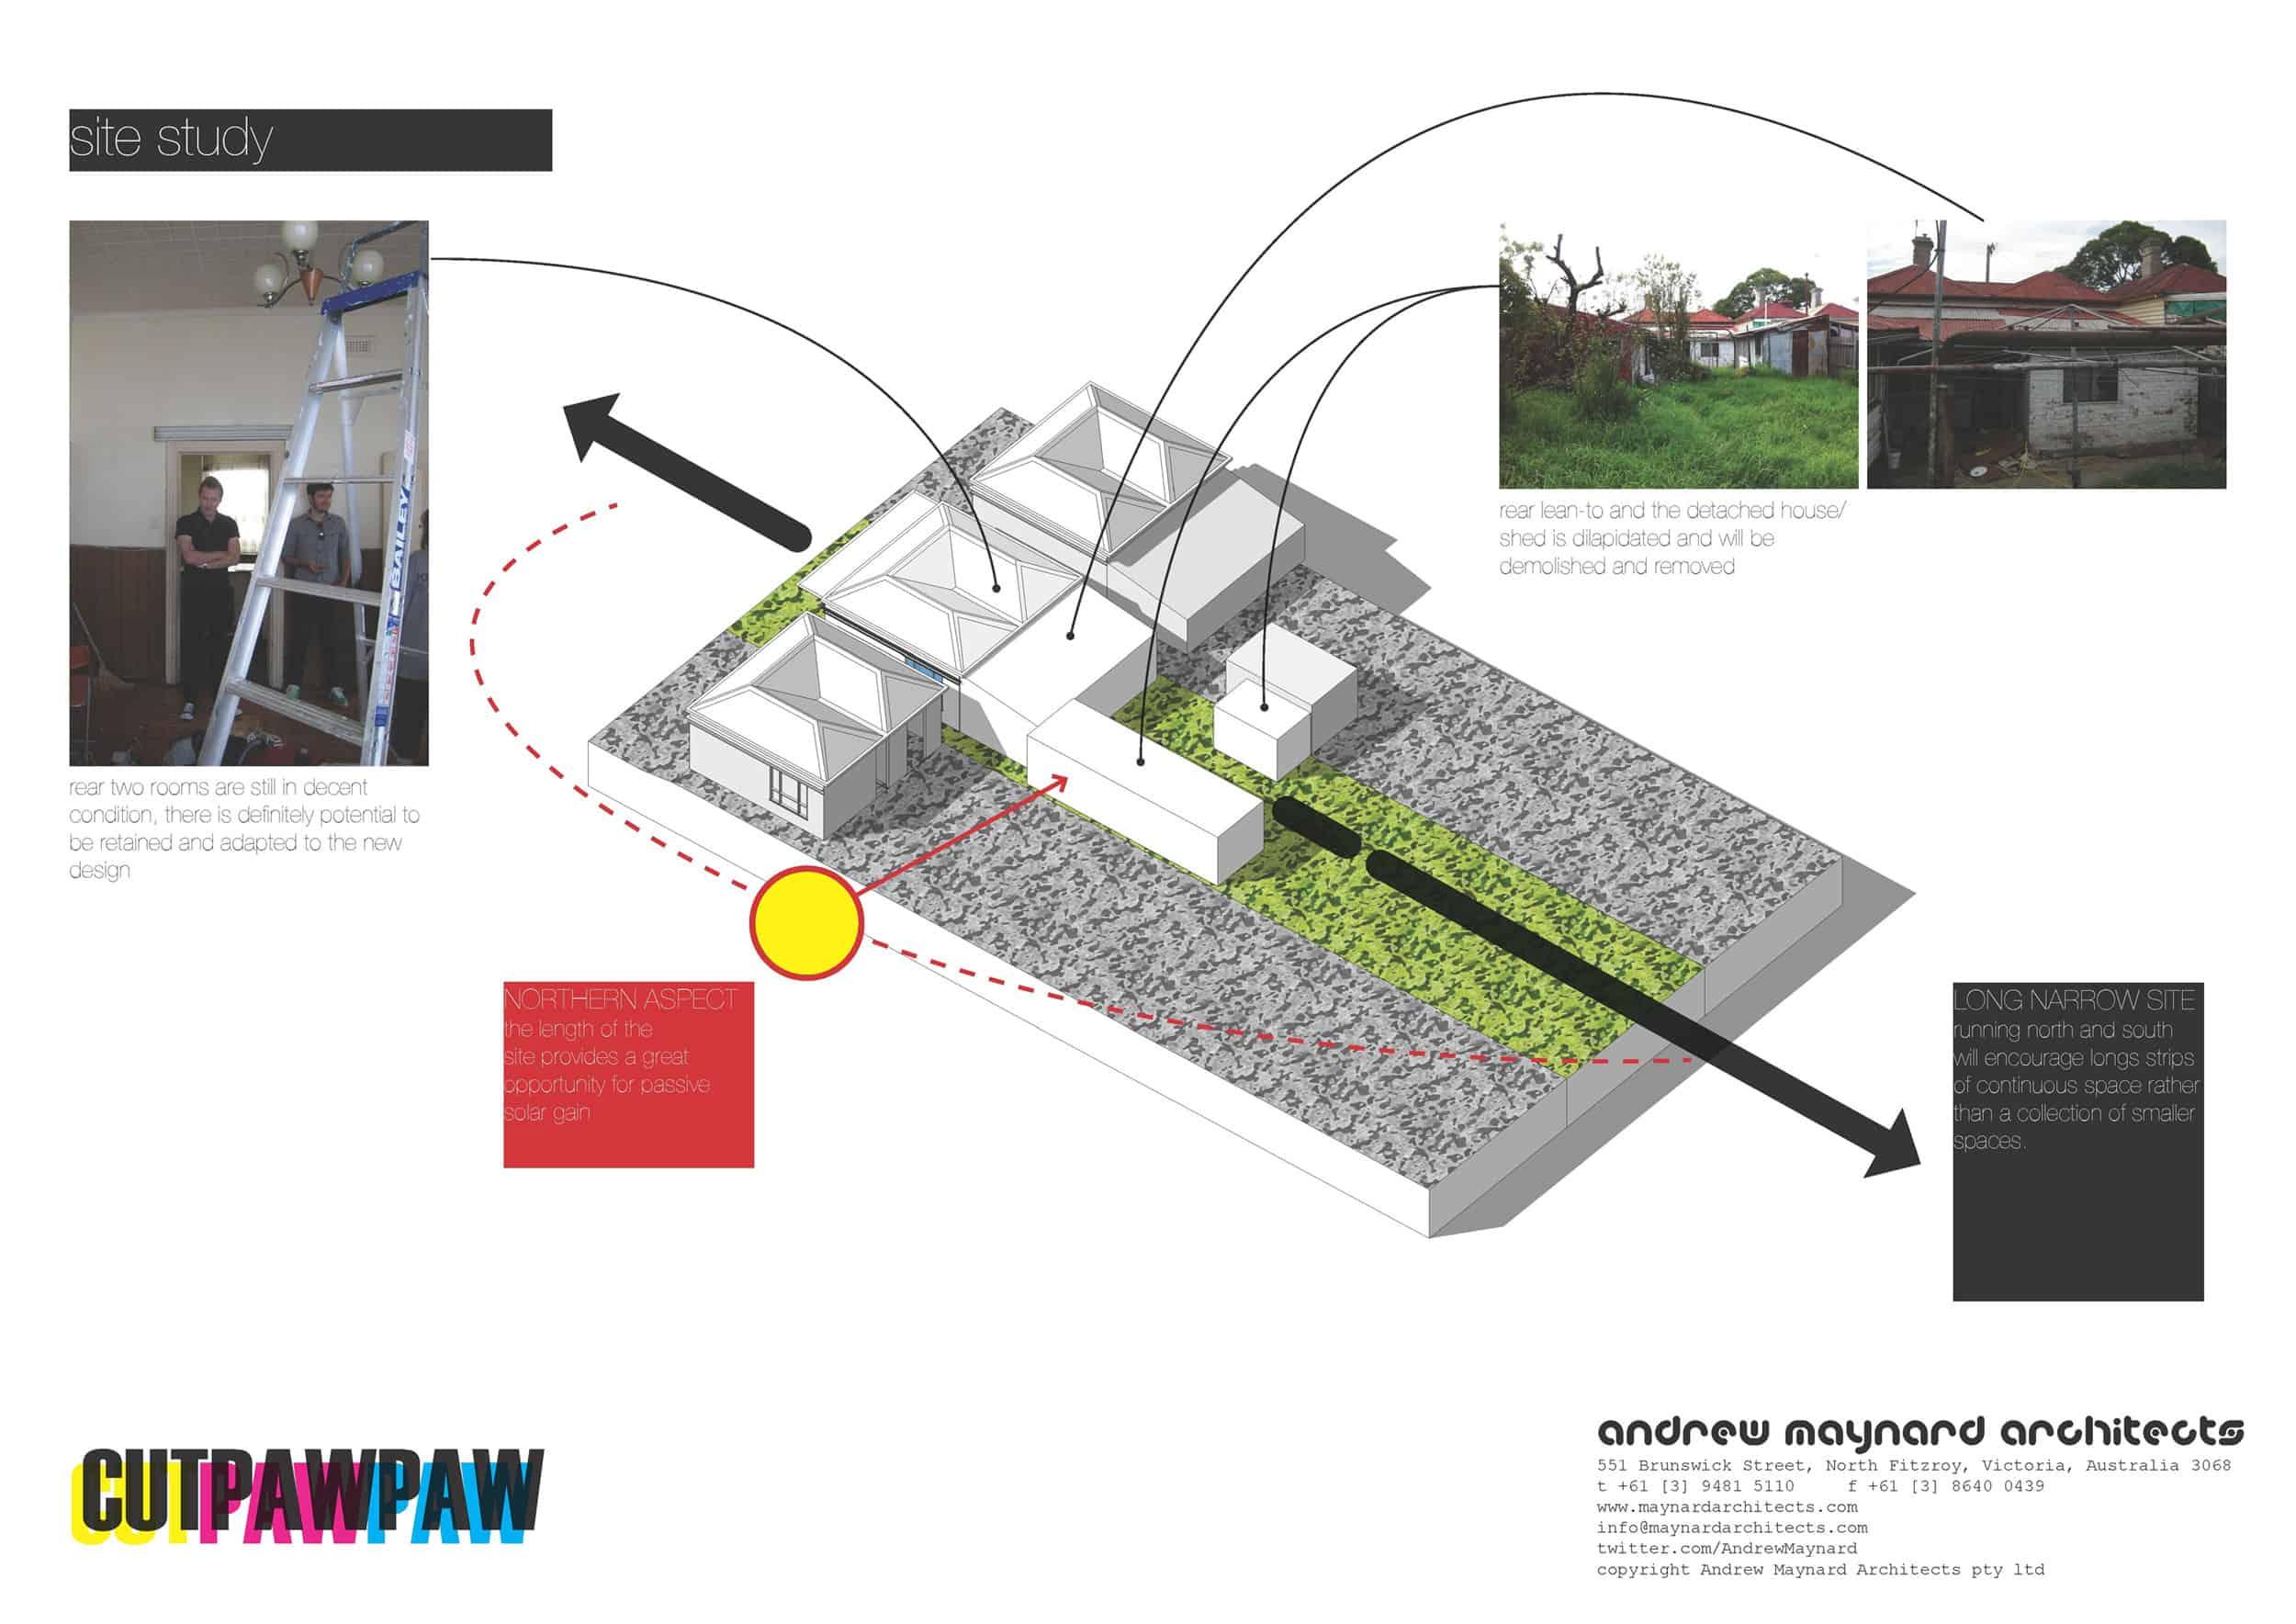 Cut Paw Paw by Andrew Maynard Architects (22)